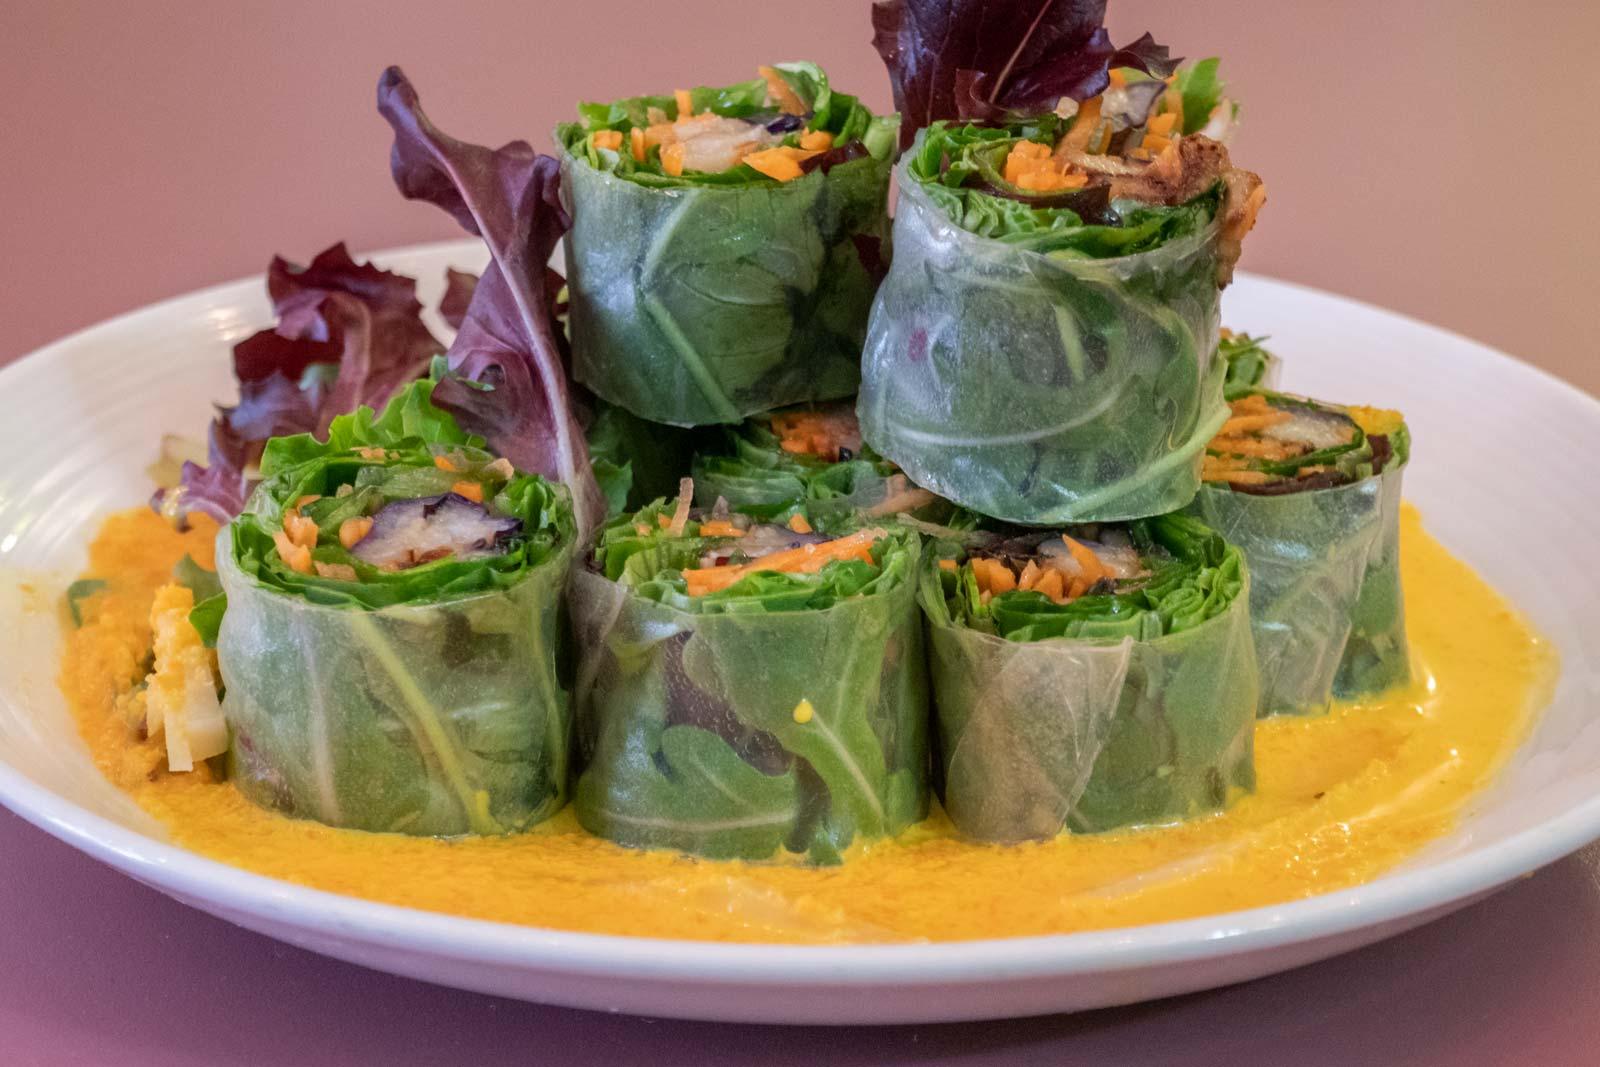 Go Vegan Cuisine New York catering